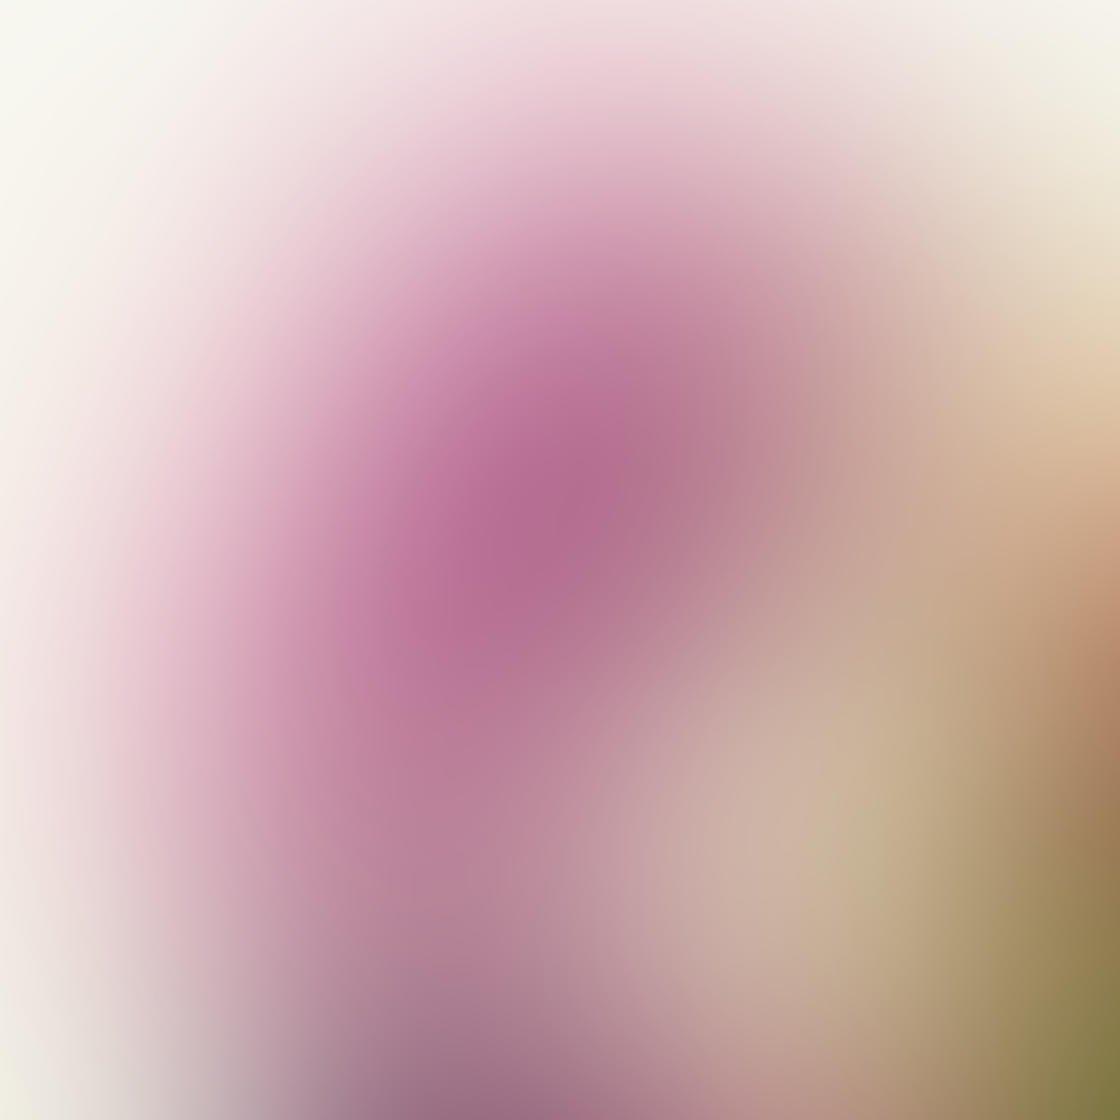 iPhone Photo Exposure 13